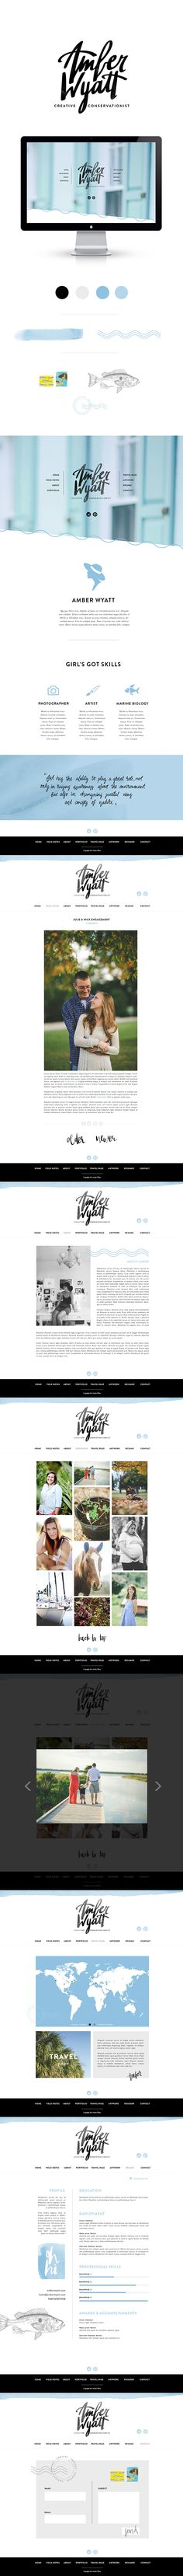 Website Redesigns - Cocorrina by Corina Nika